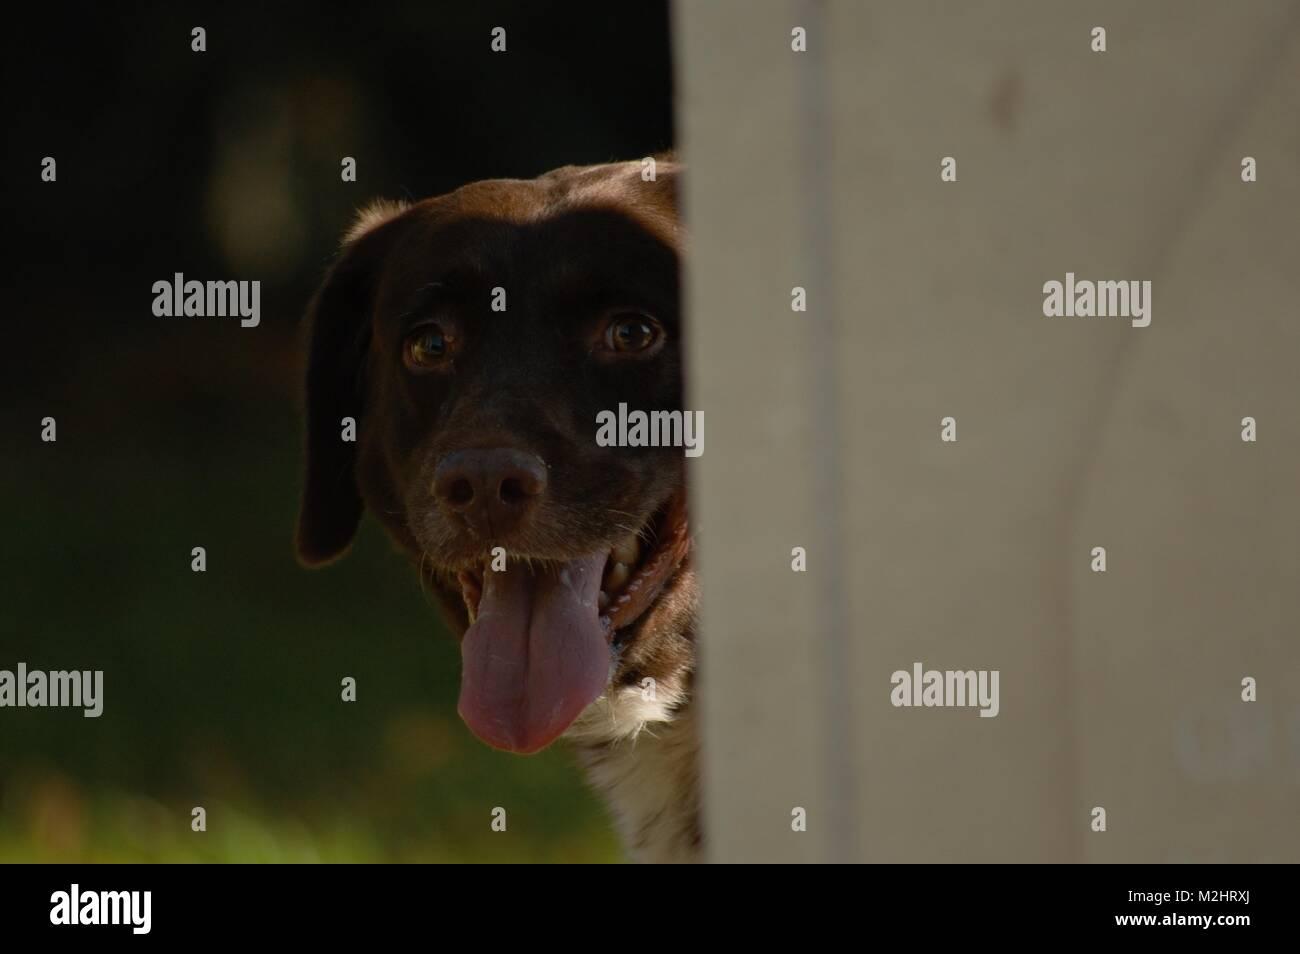 Dog Peeping - Stock Image